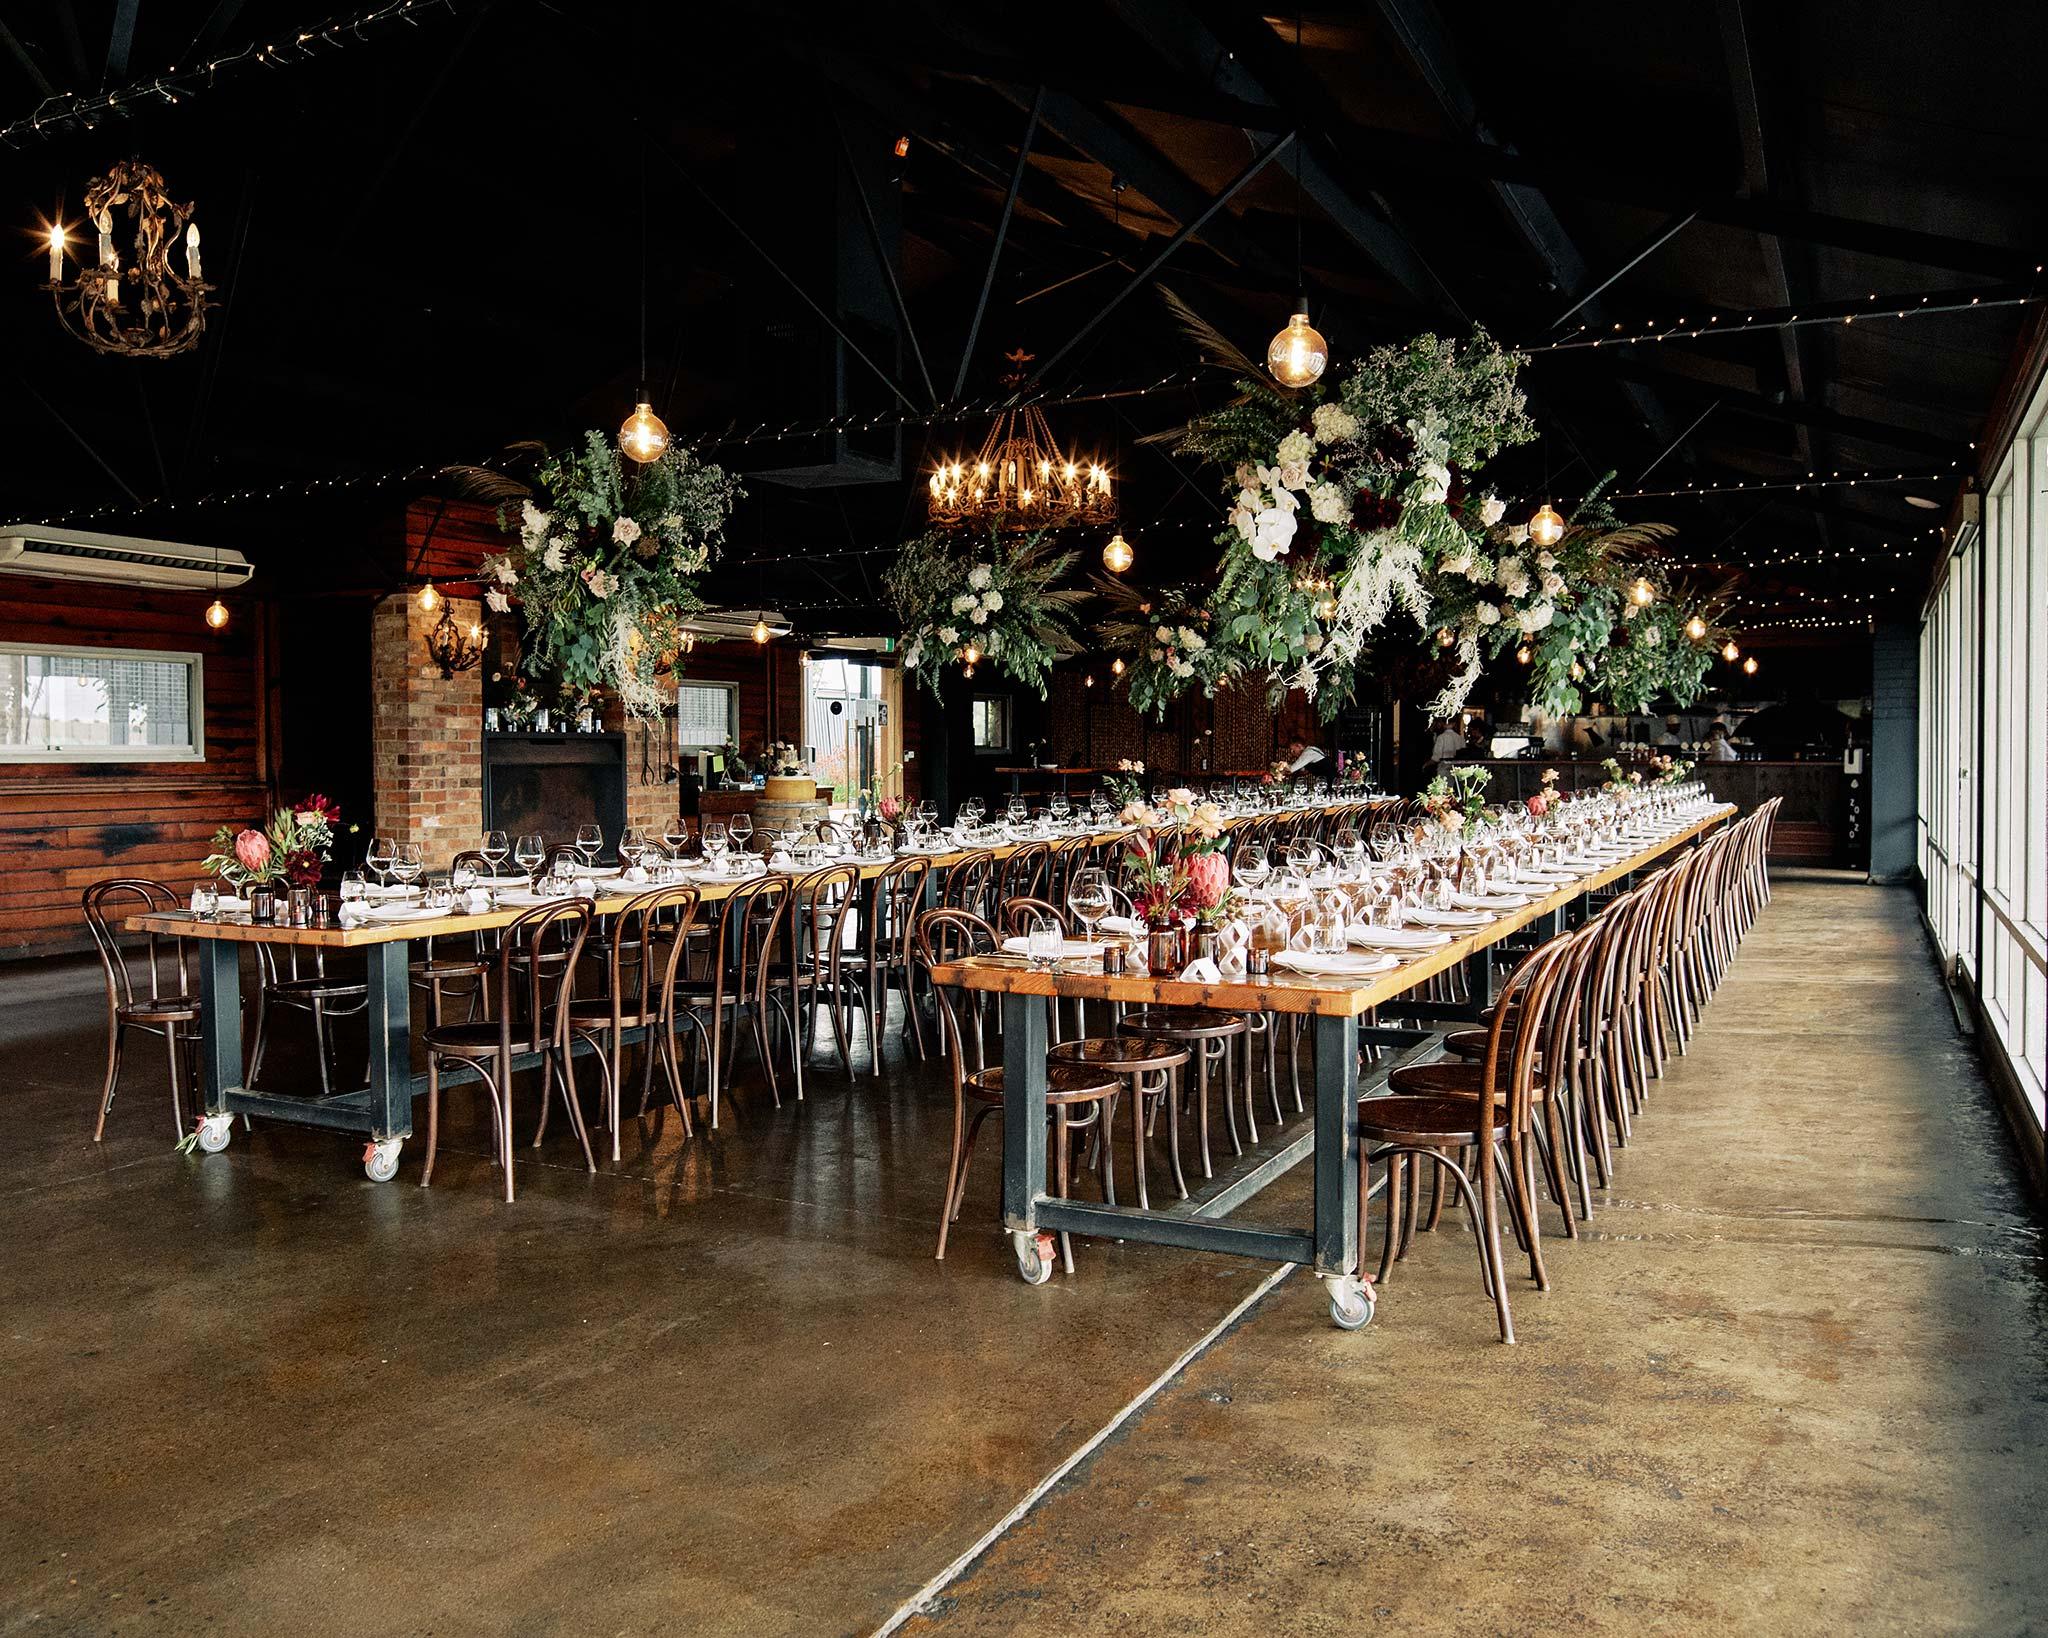 Zonzo estate wedding reception decoration of tables